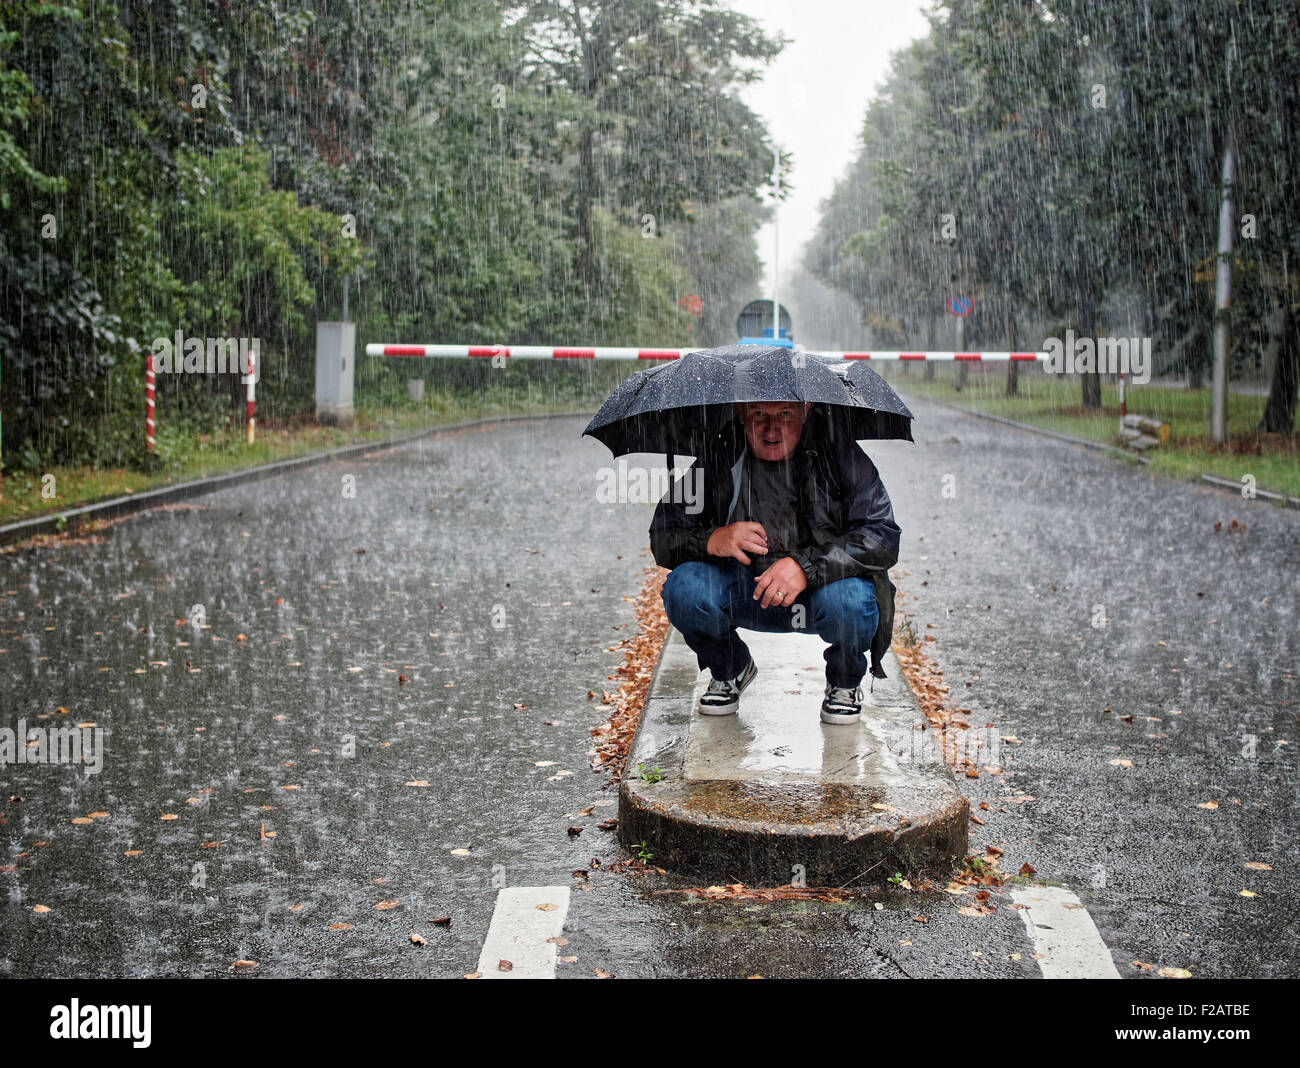 Male crouching under umbrella on a rainy day - Stock Image